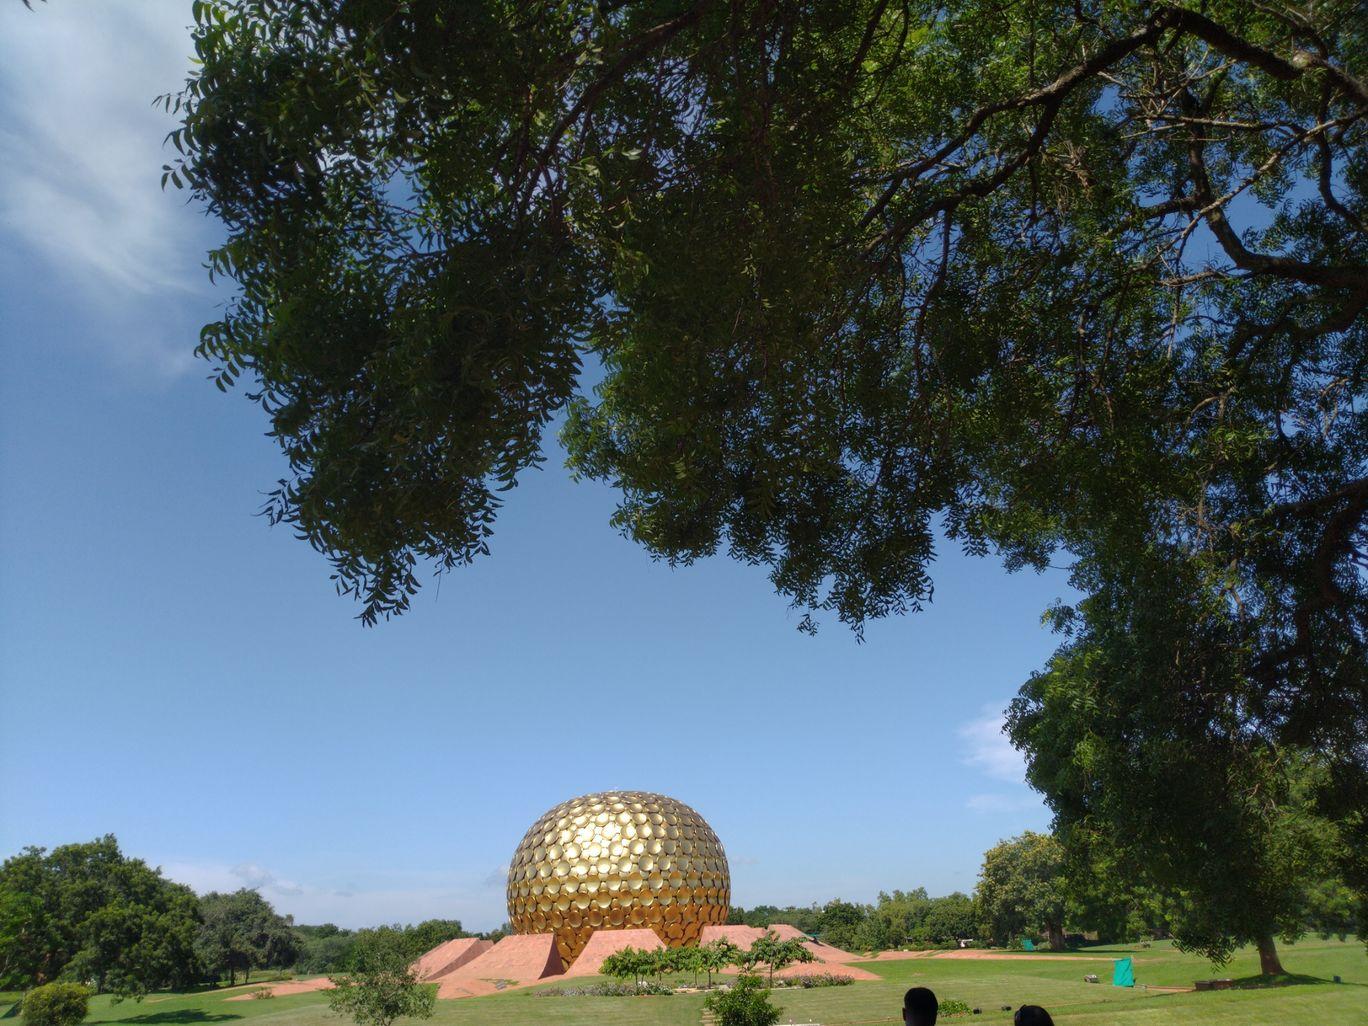 Photo of Auroville: The City of Dawn By Pratiyush Sah